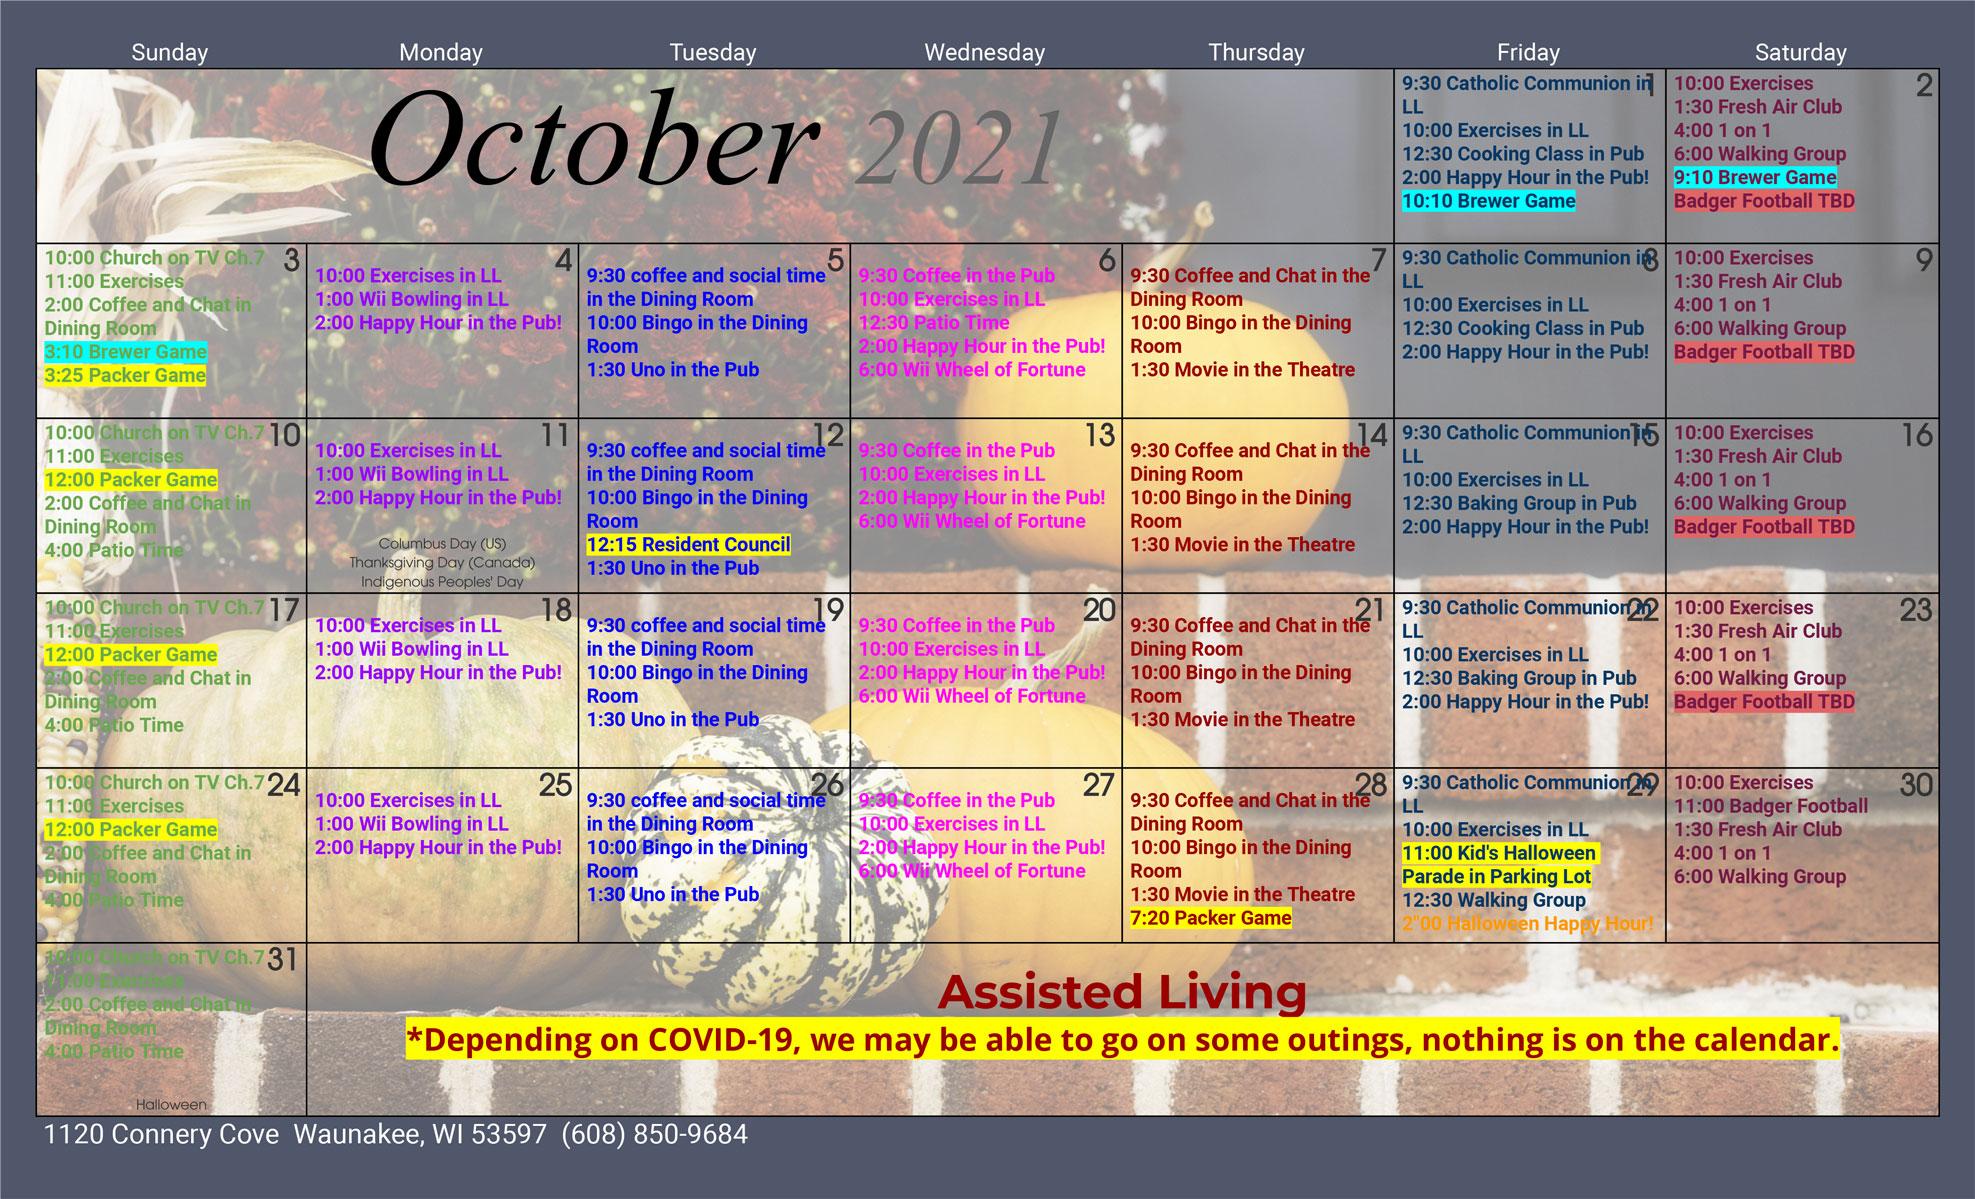 Waunakee Assisted Living October 2021 Activity Calendar